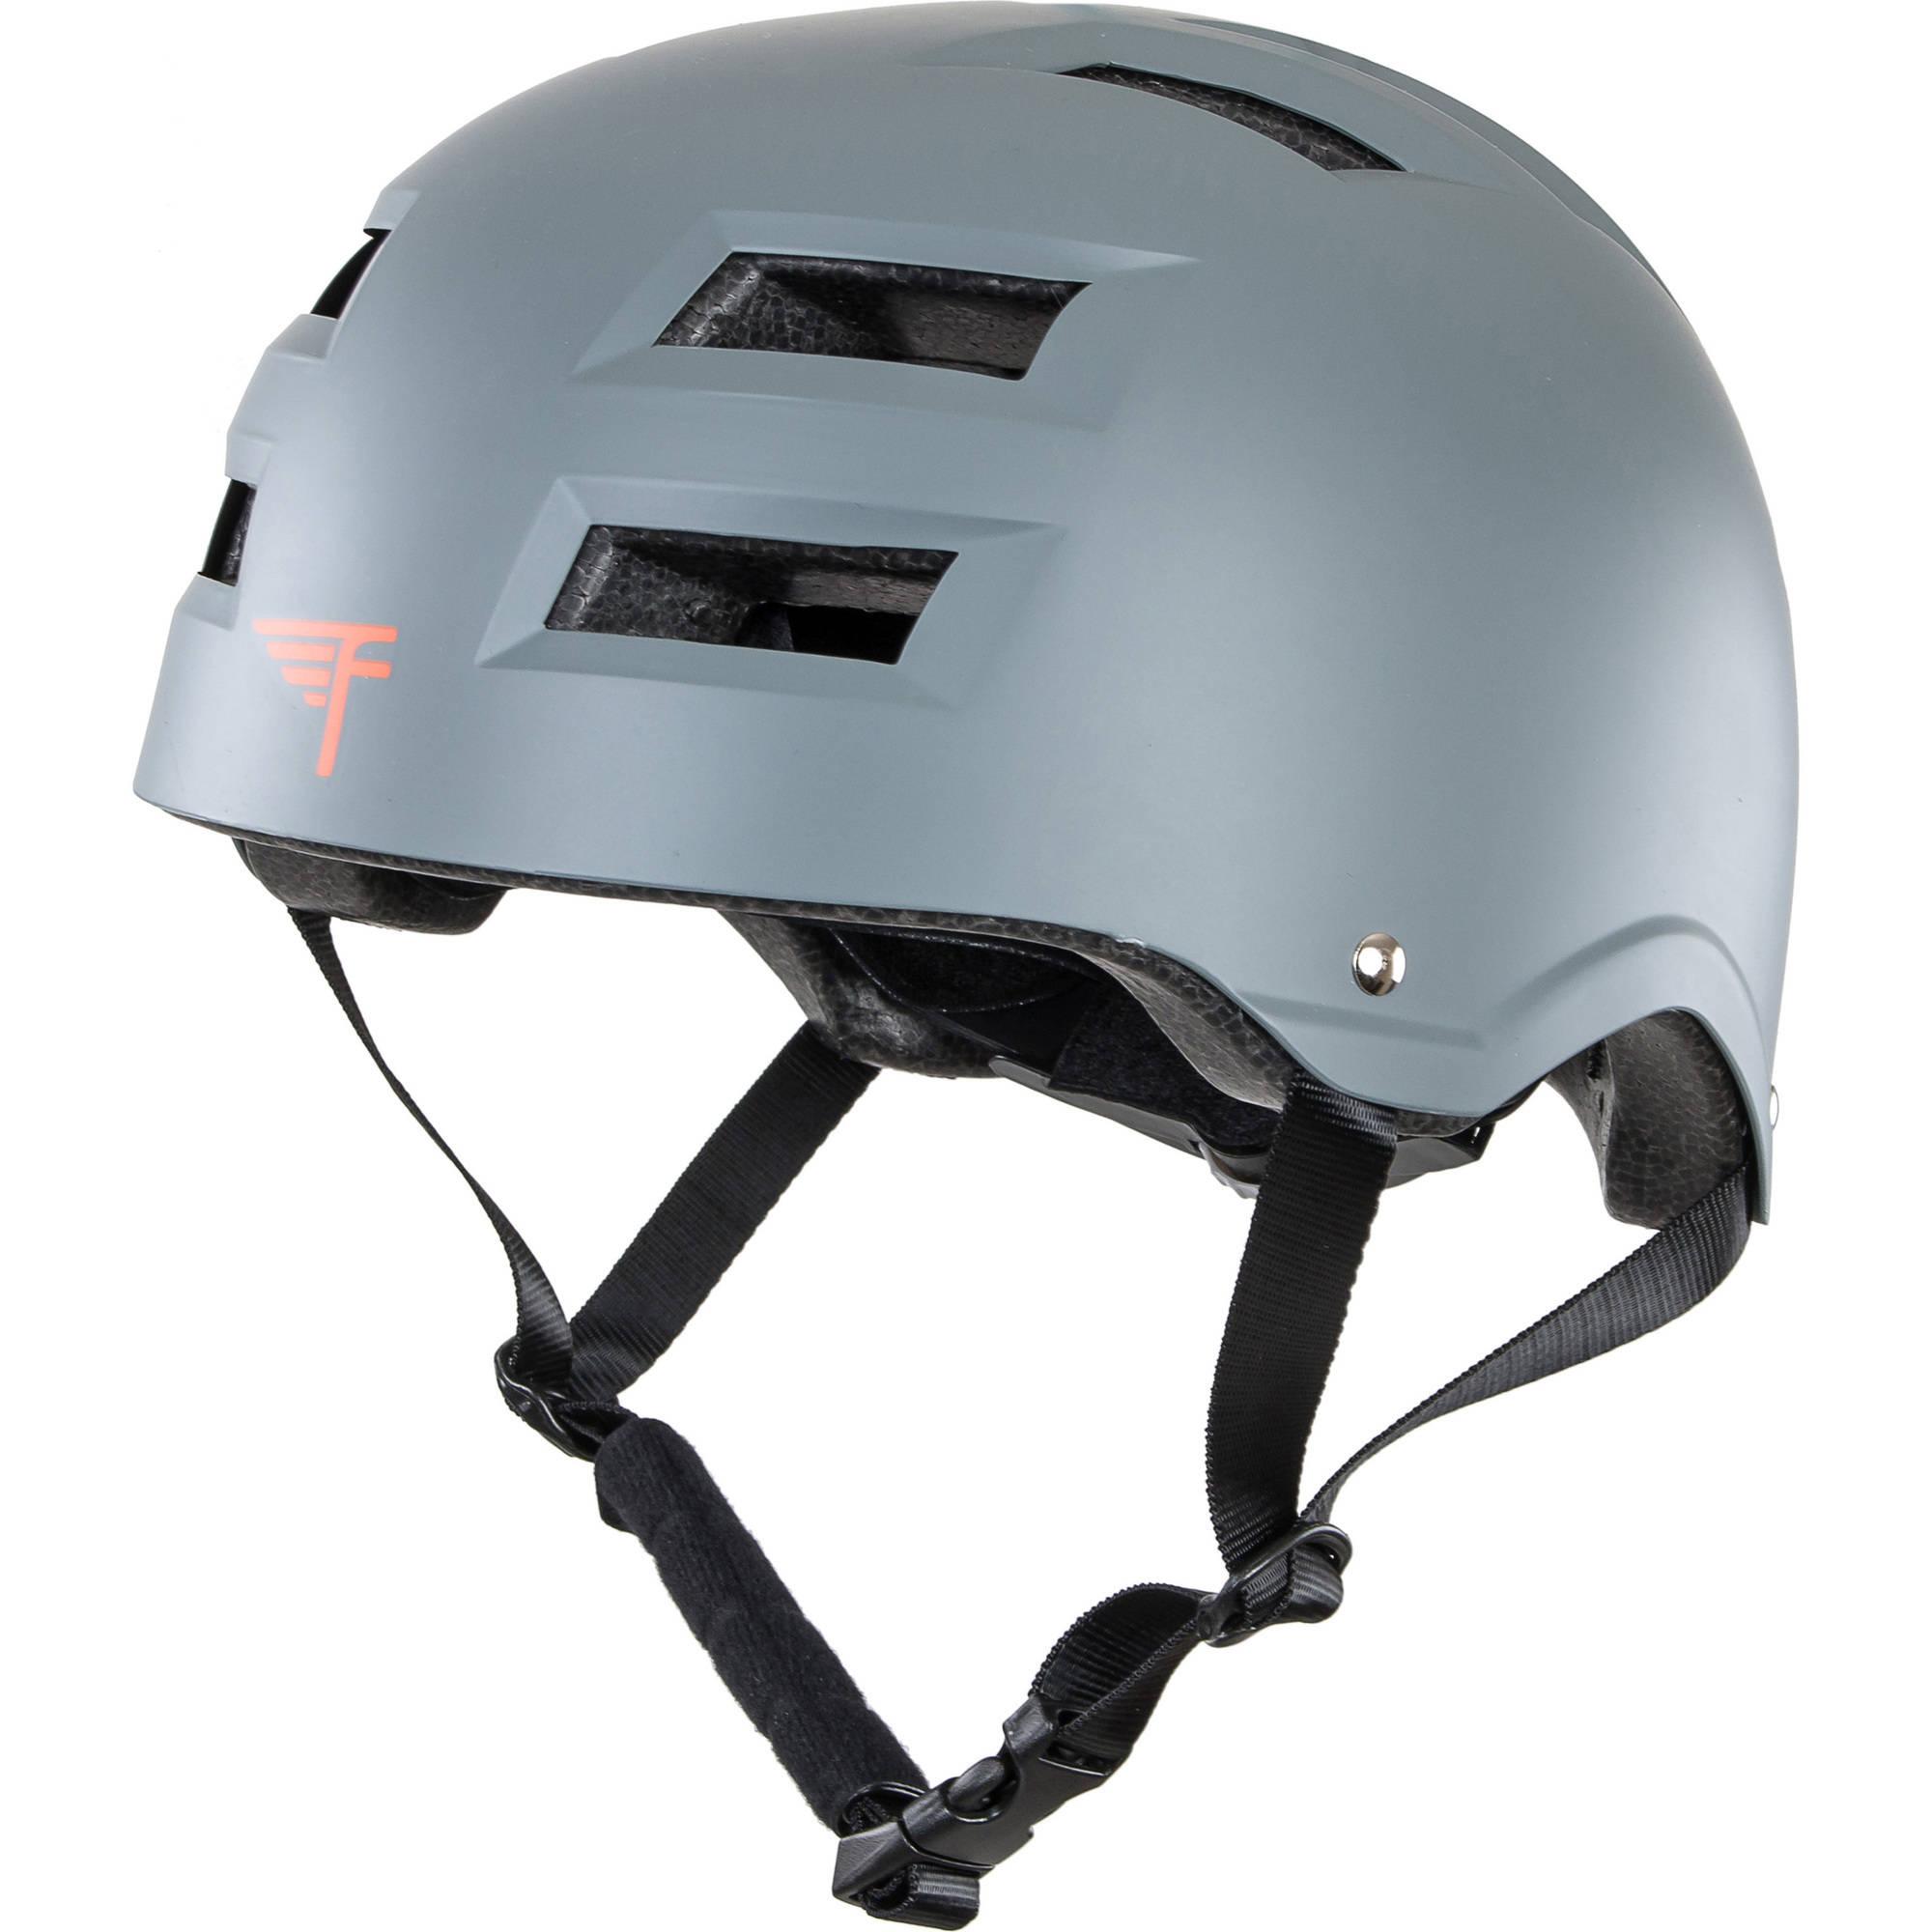 Flybar Multi Sport Helmet, Grey, M L by Flybar